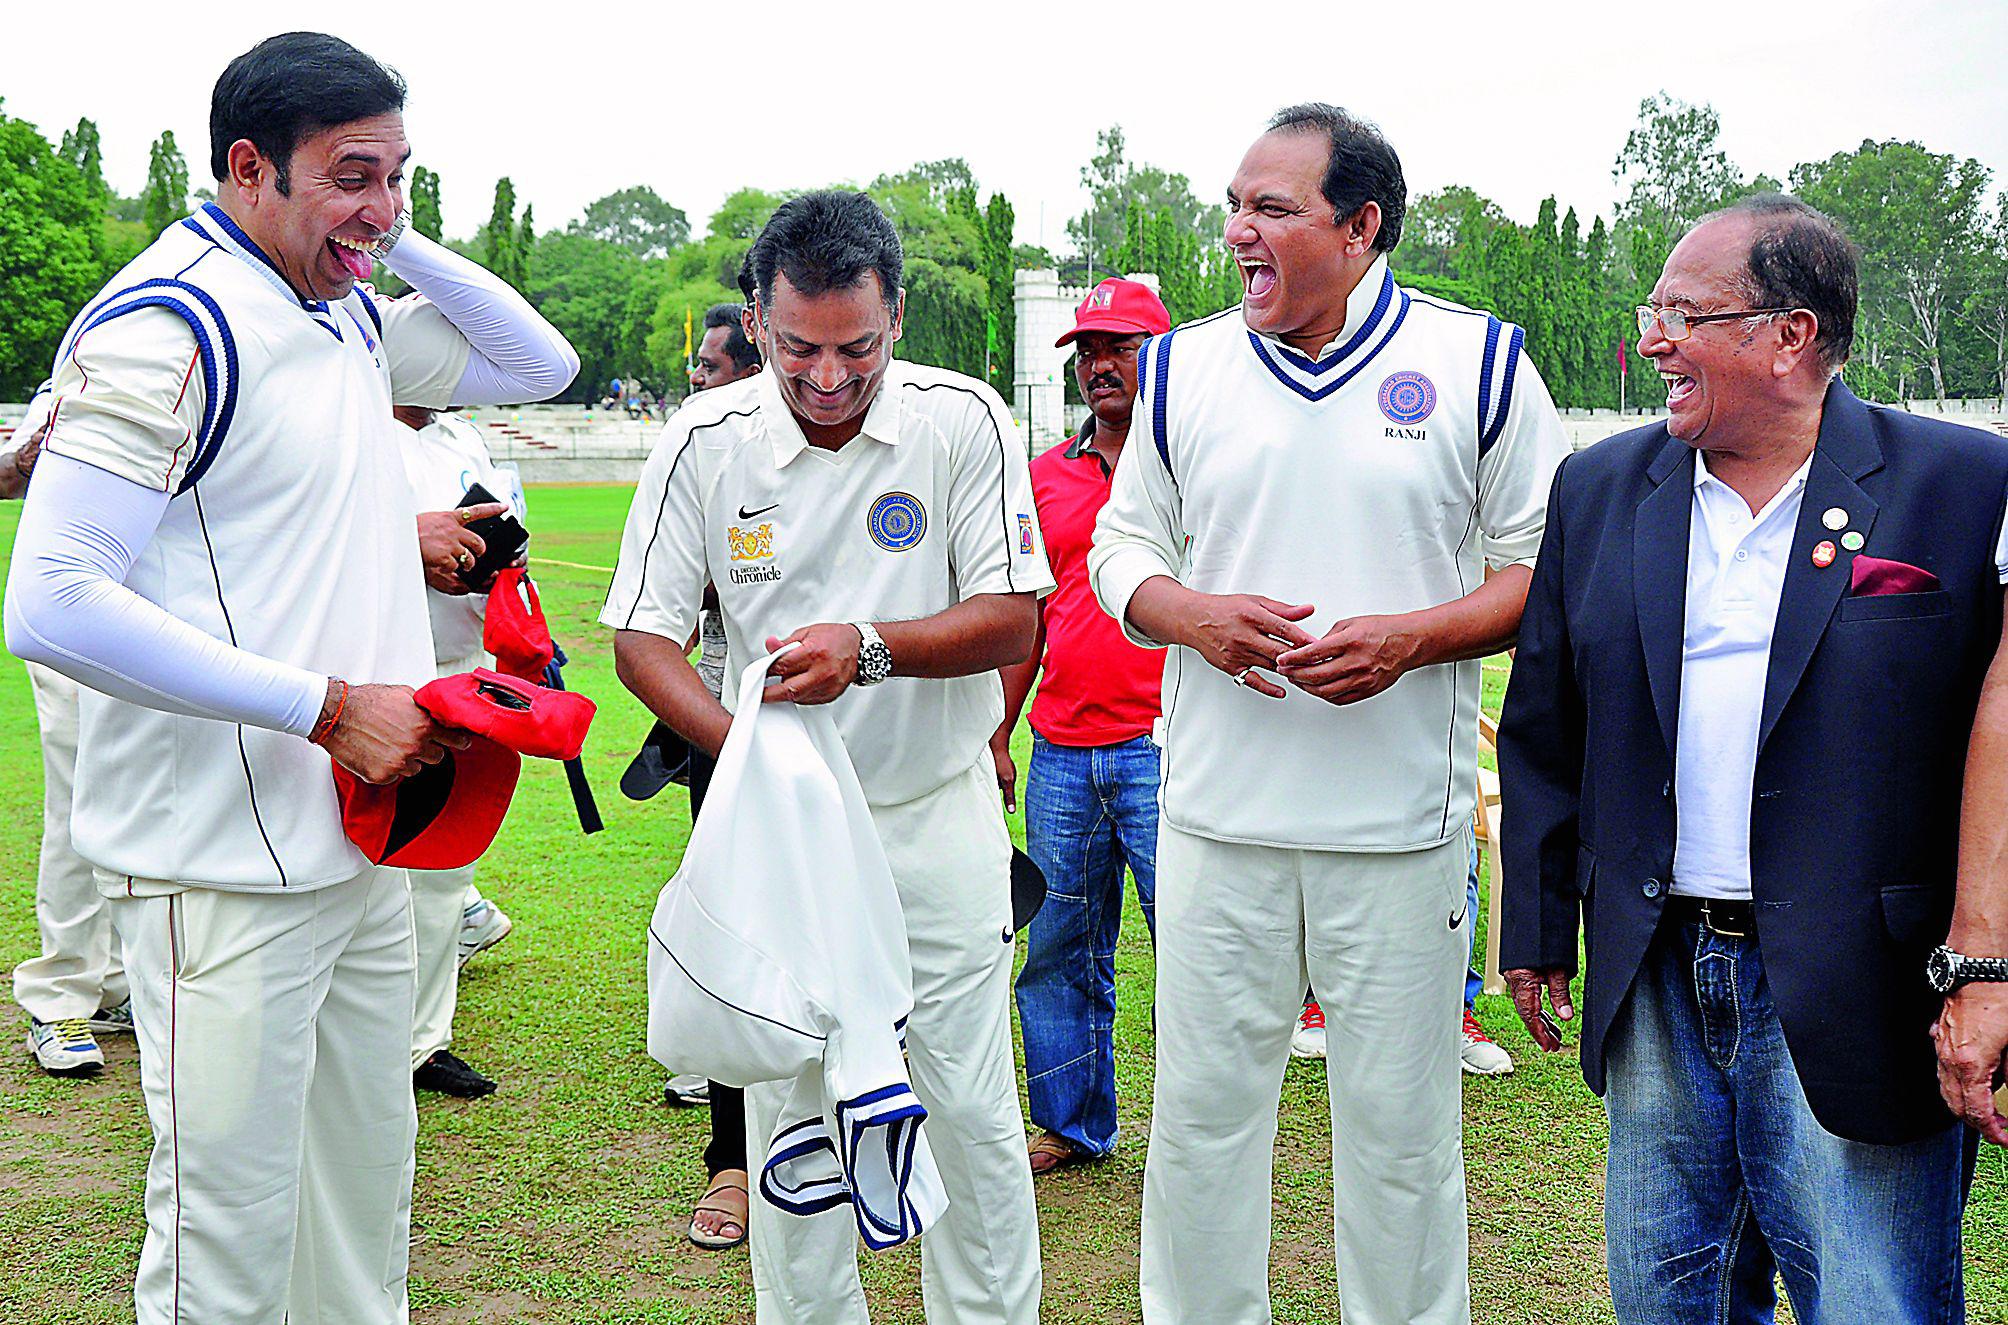 Former Indian cricketers V.V.S. Laxman (from left), Venkatapathy Raju and Mohammad Azharuddin share a light moment at Thapar Stadium at AOC Centre in Secunderabad on Sunday. (Photo: Deepak Deshpande)